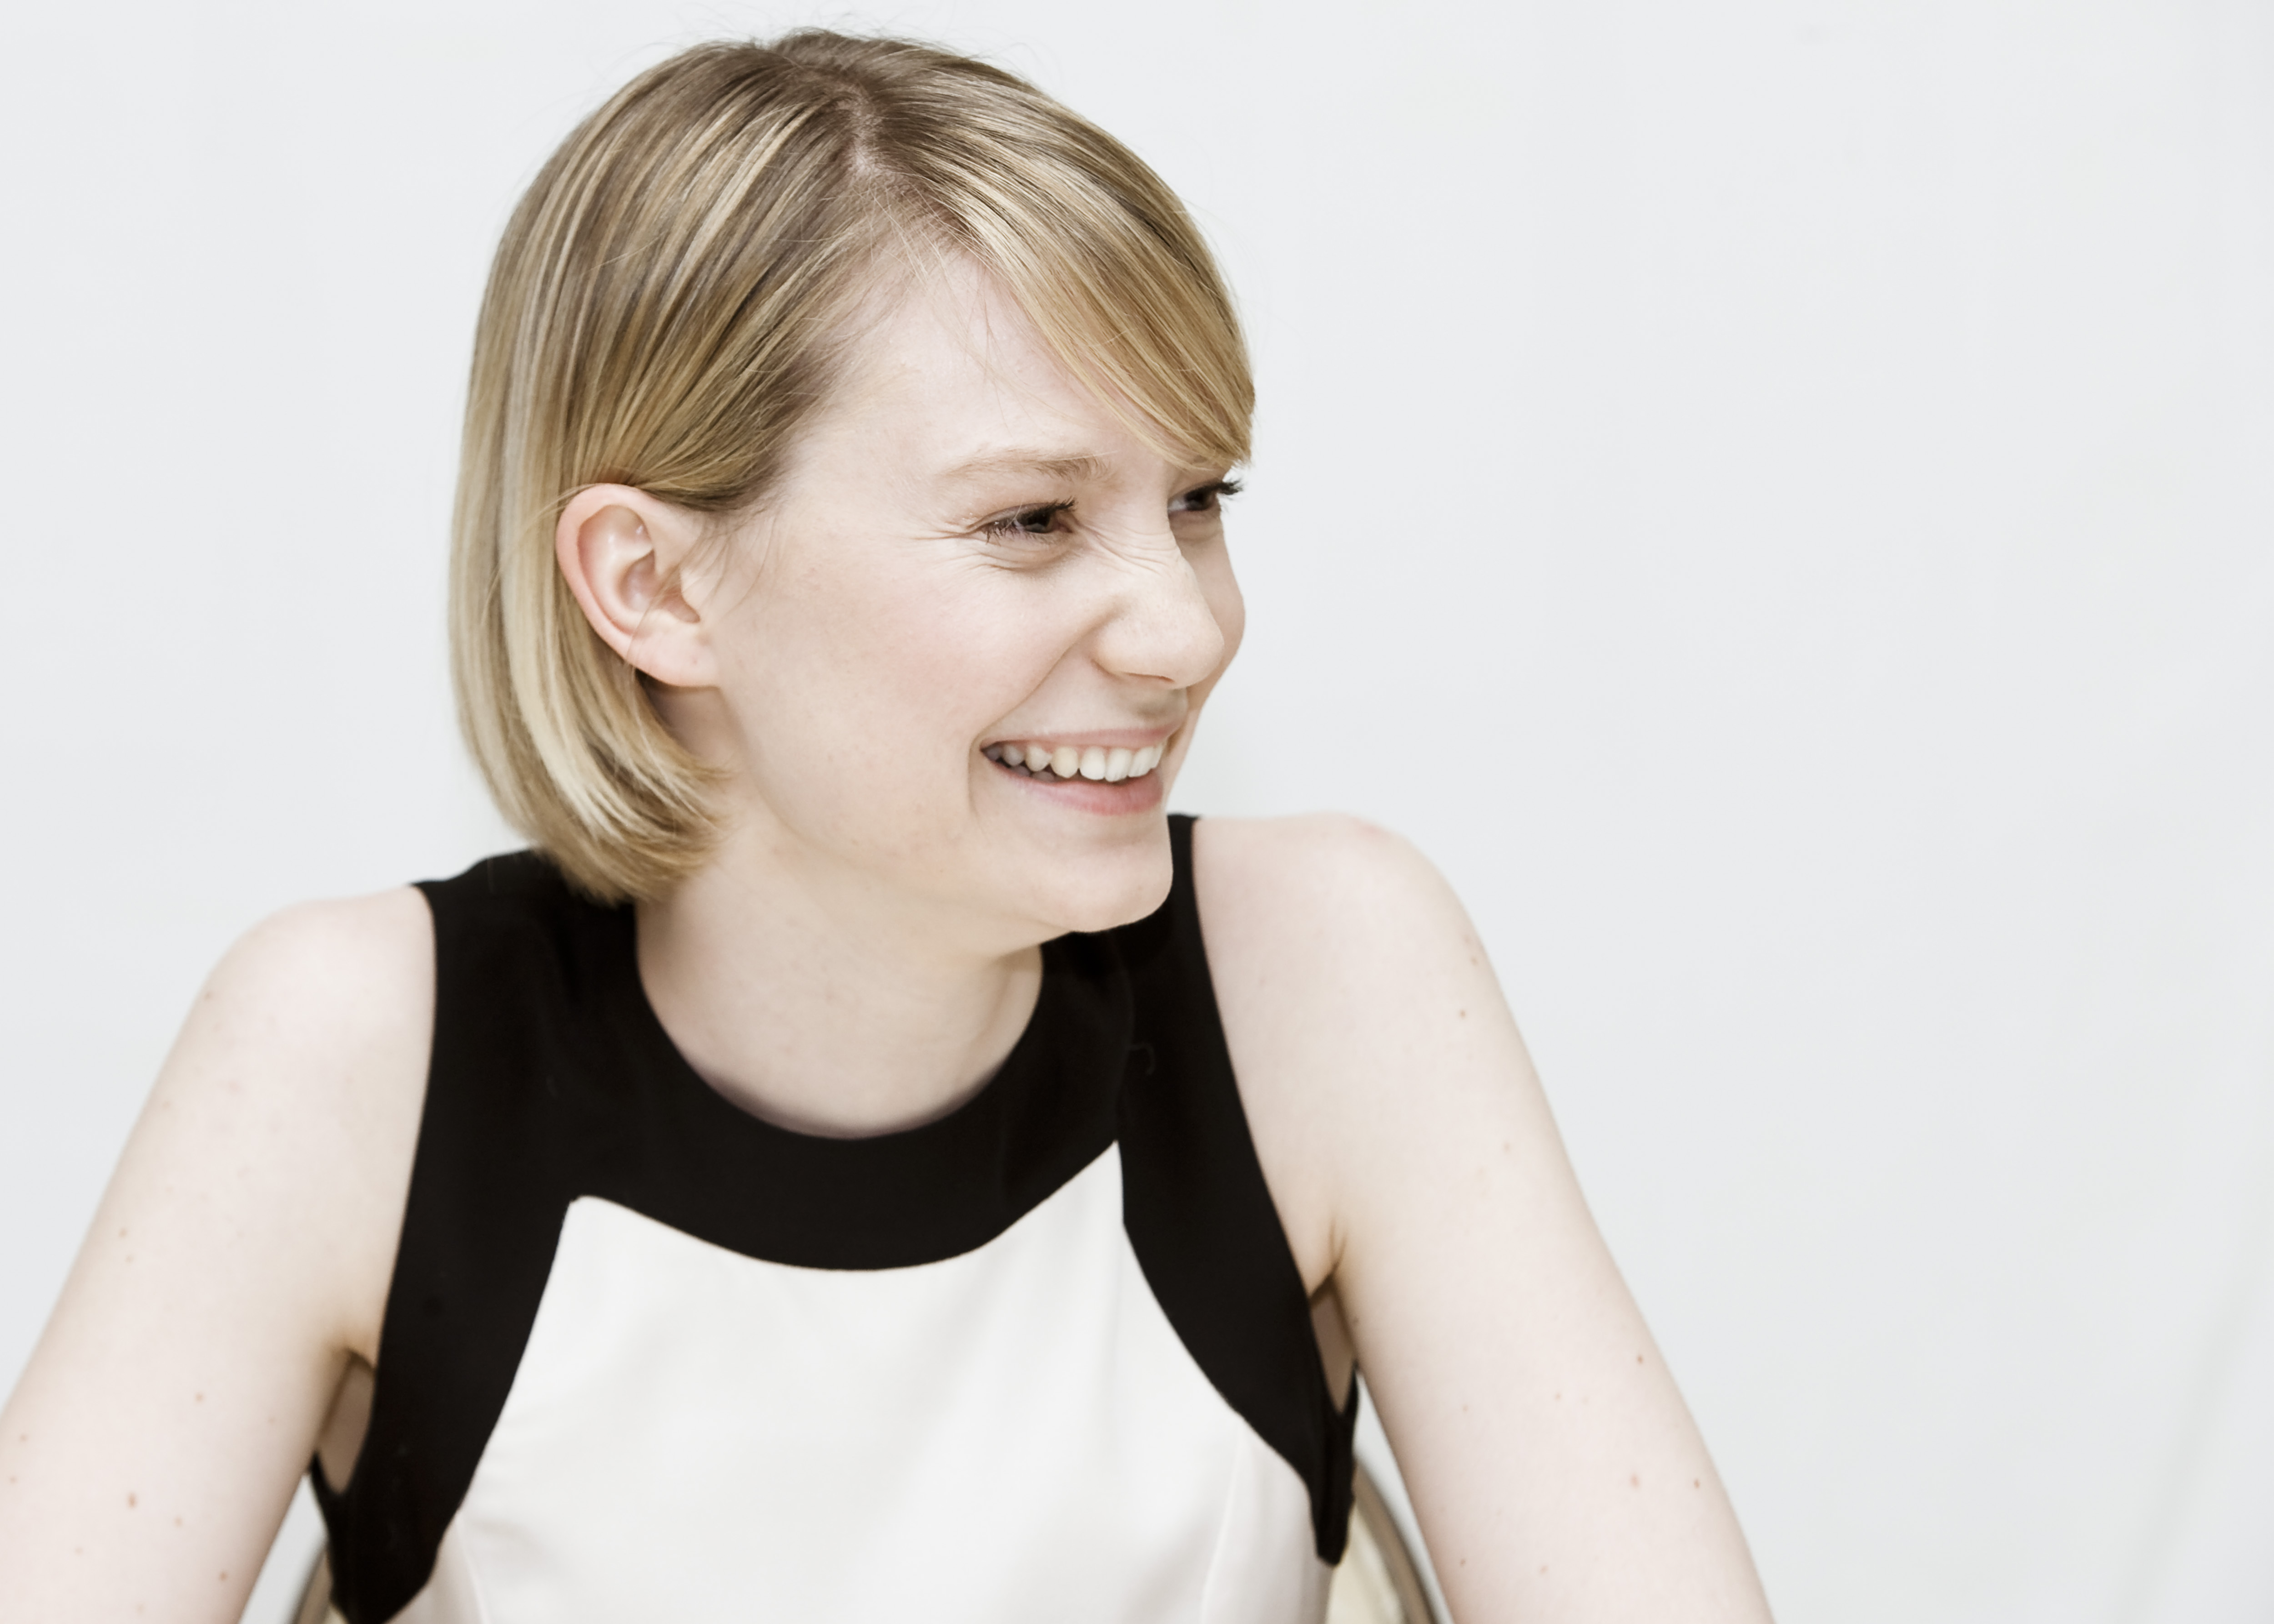 Images Of Mia Wasikowska